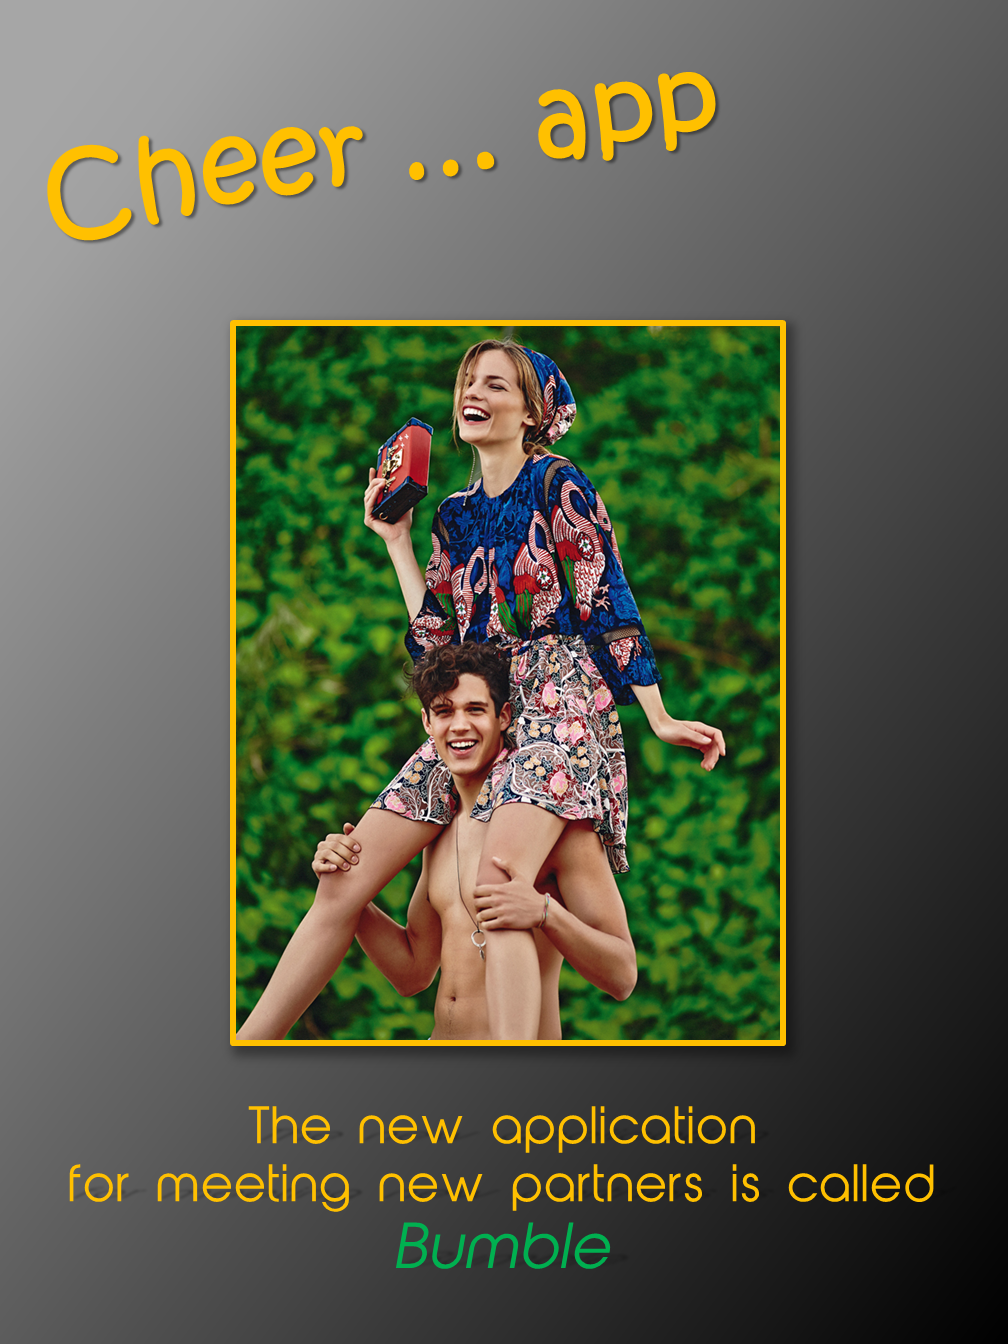 Cheer...app